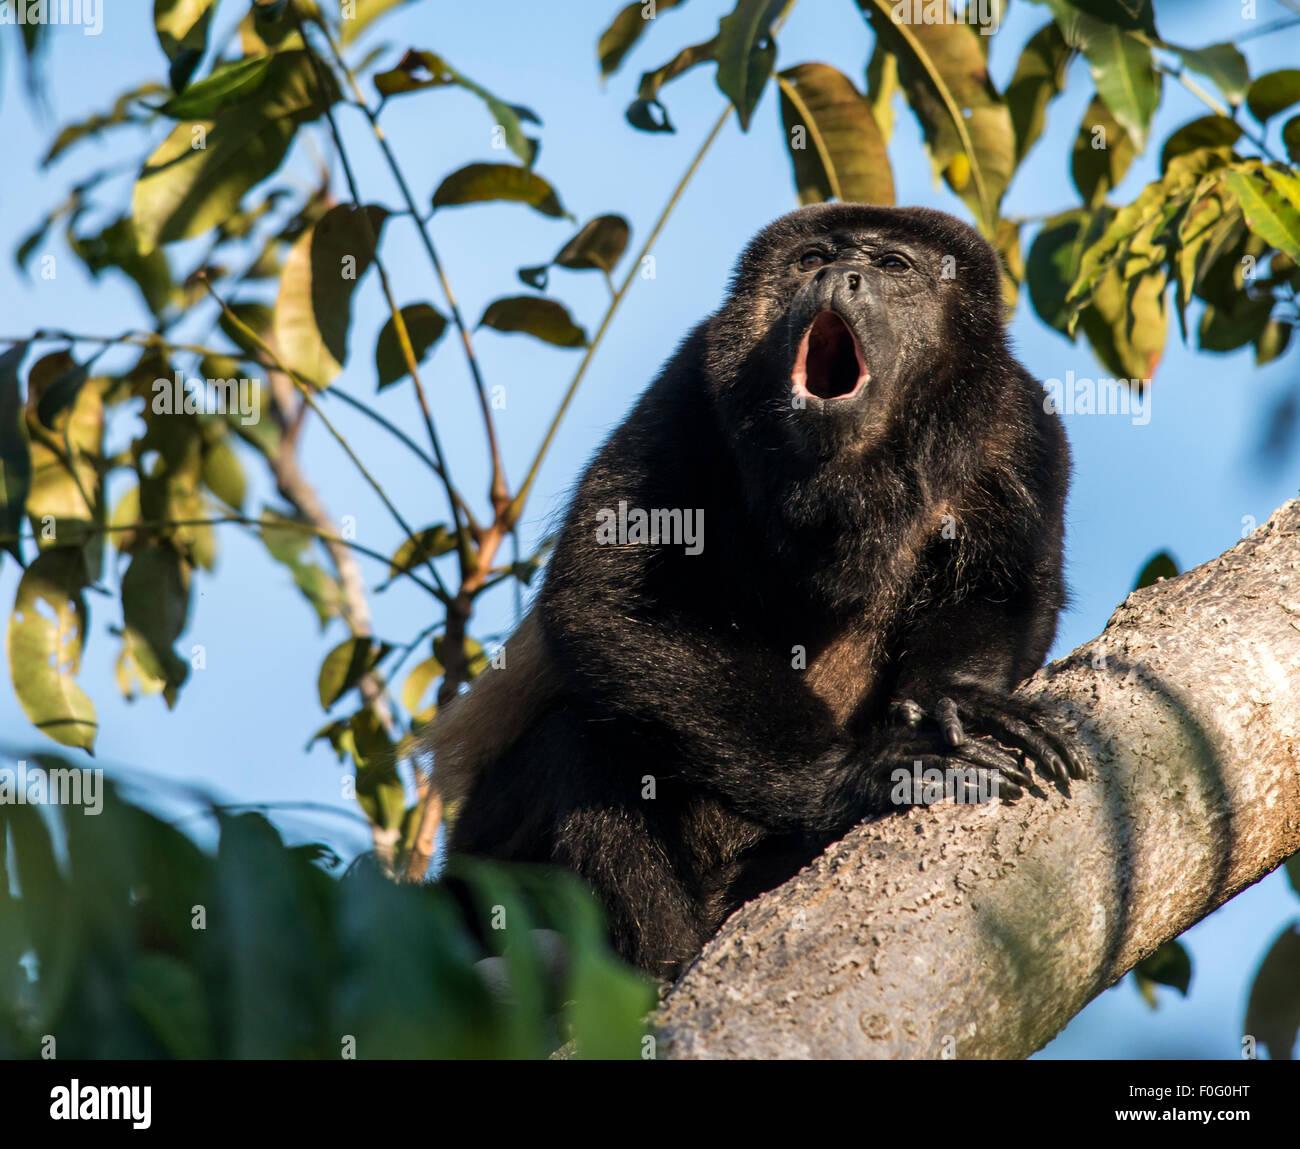 Adult mantled howler monkey howling on tree Monteverde Costa Rica - Stock Image